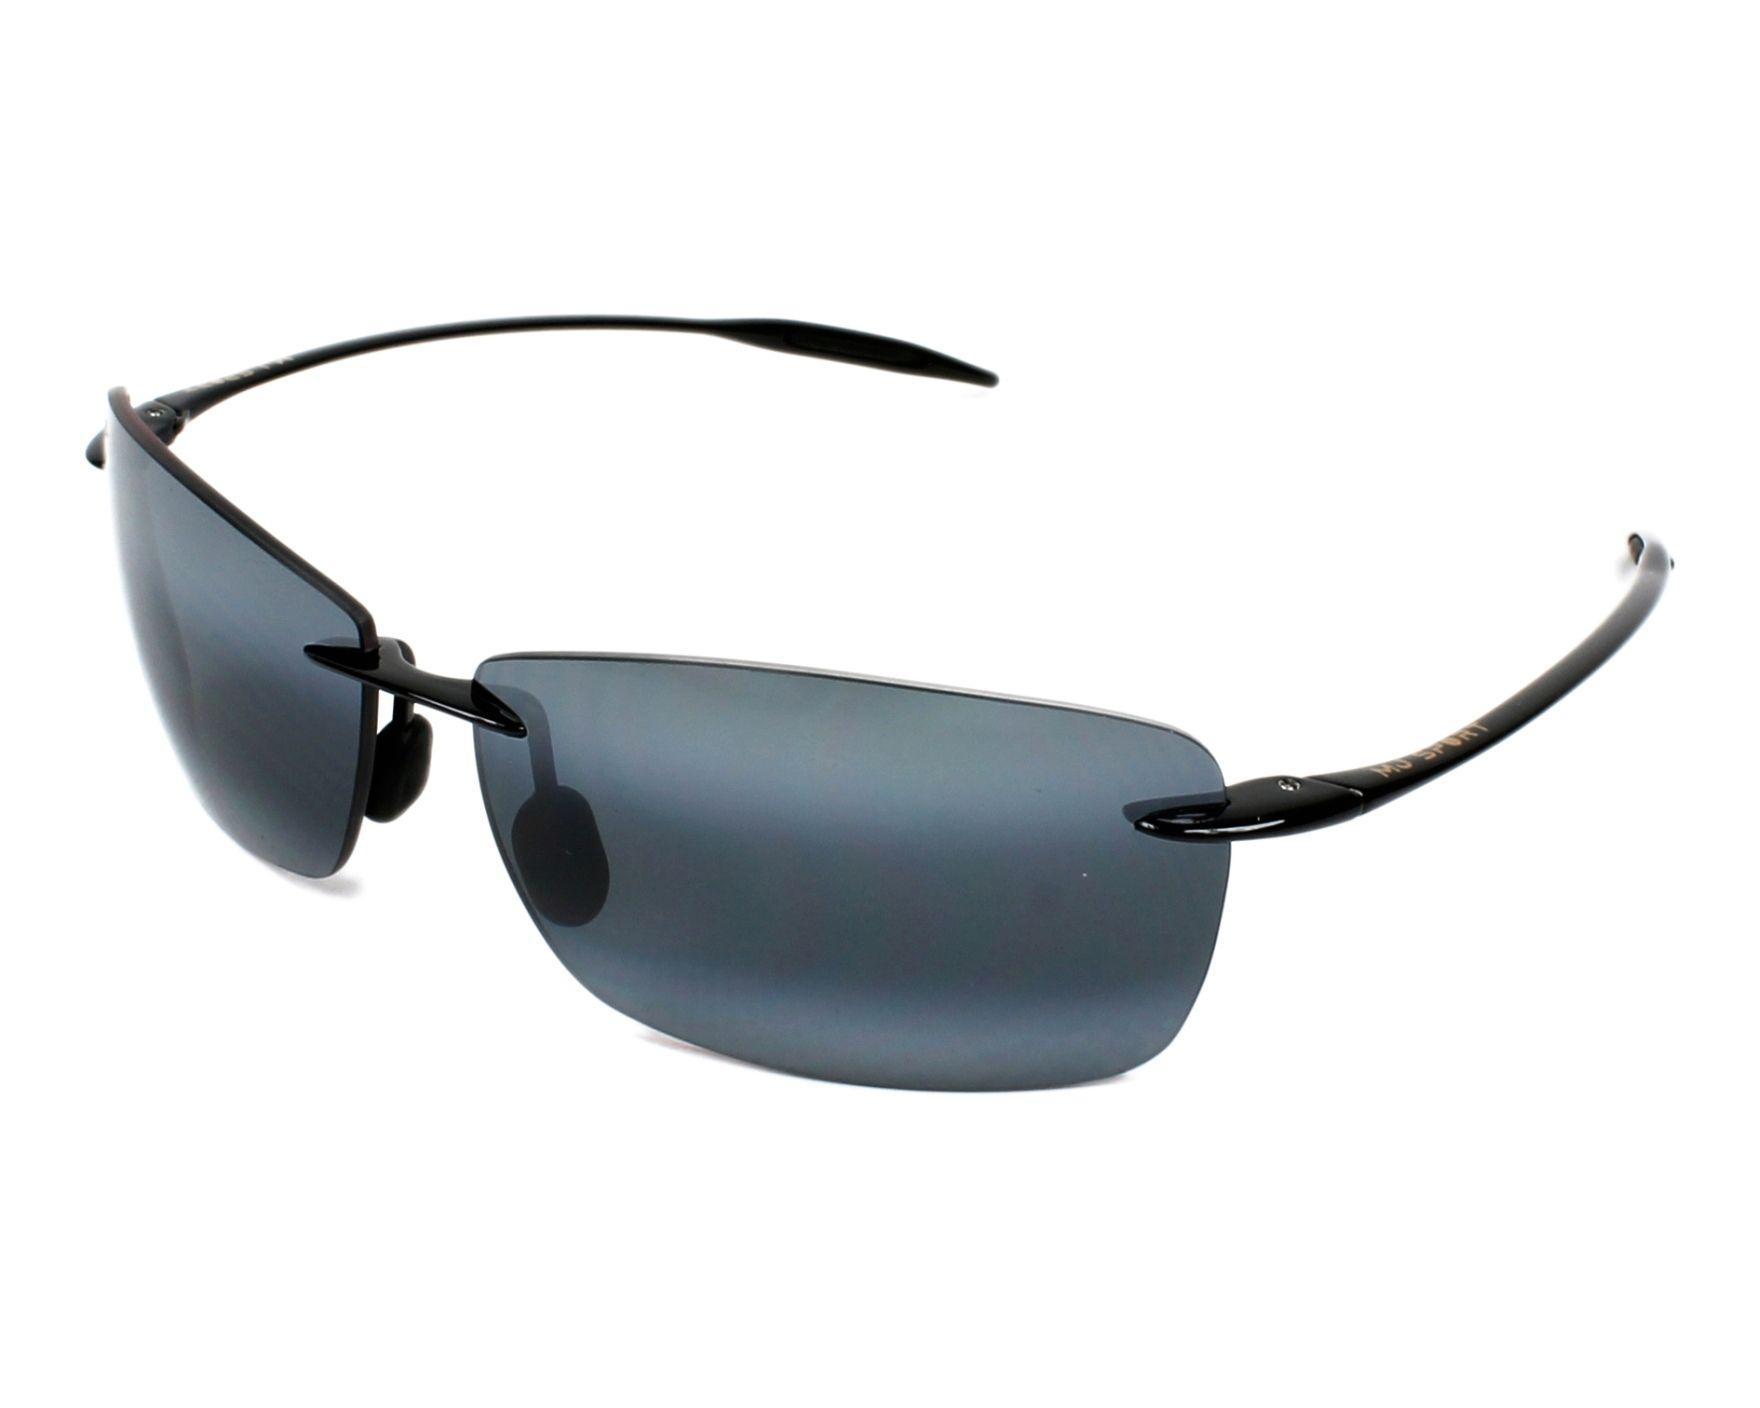 2f8724ebd7a Sunglasses Maui Jim 423 02 67-13 Black profile view